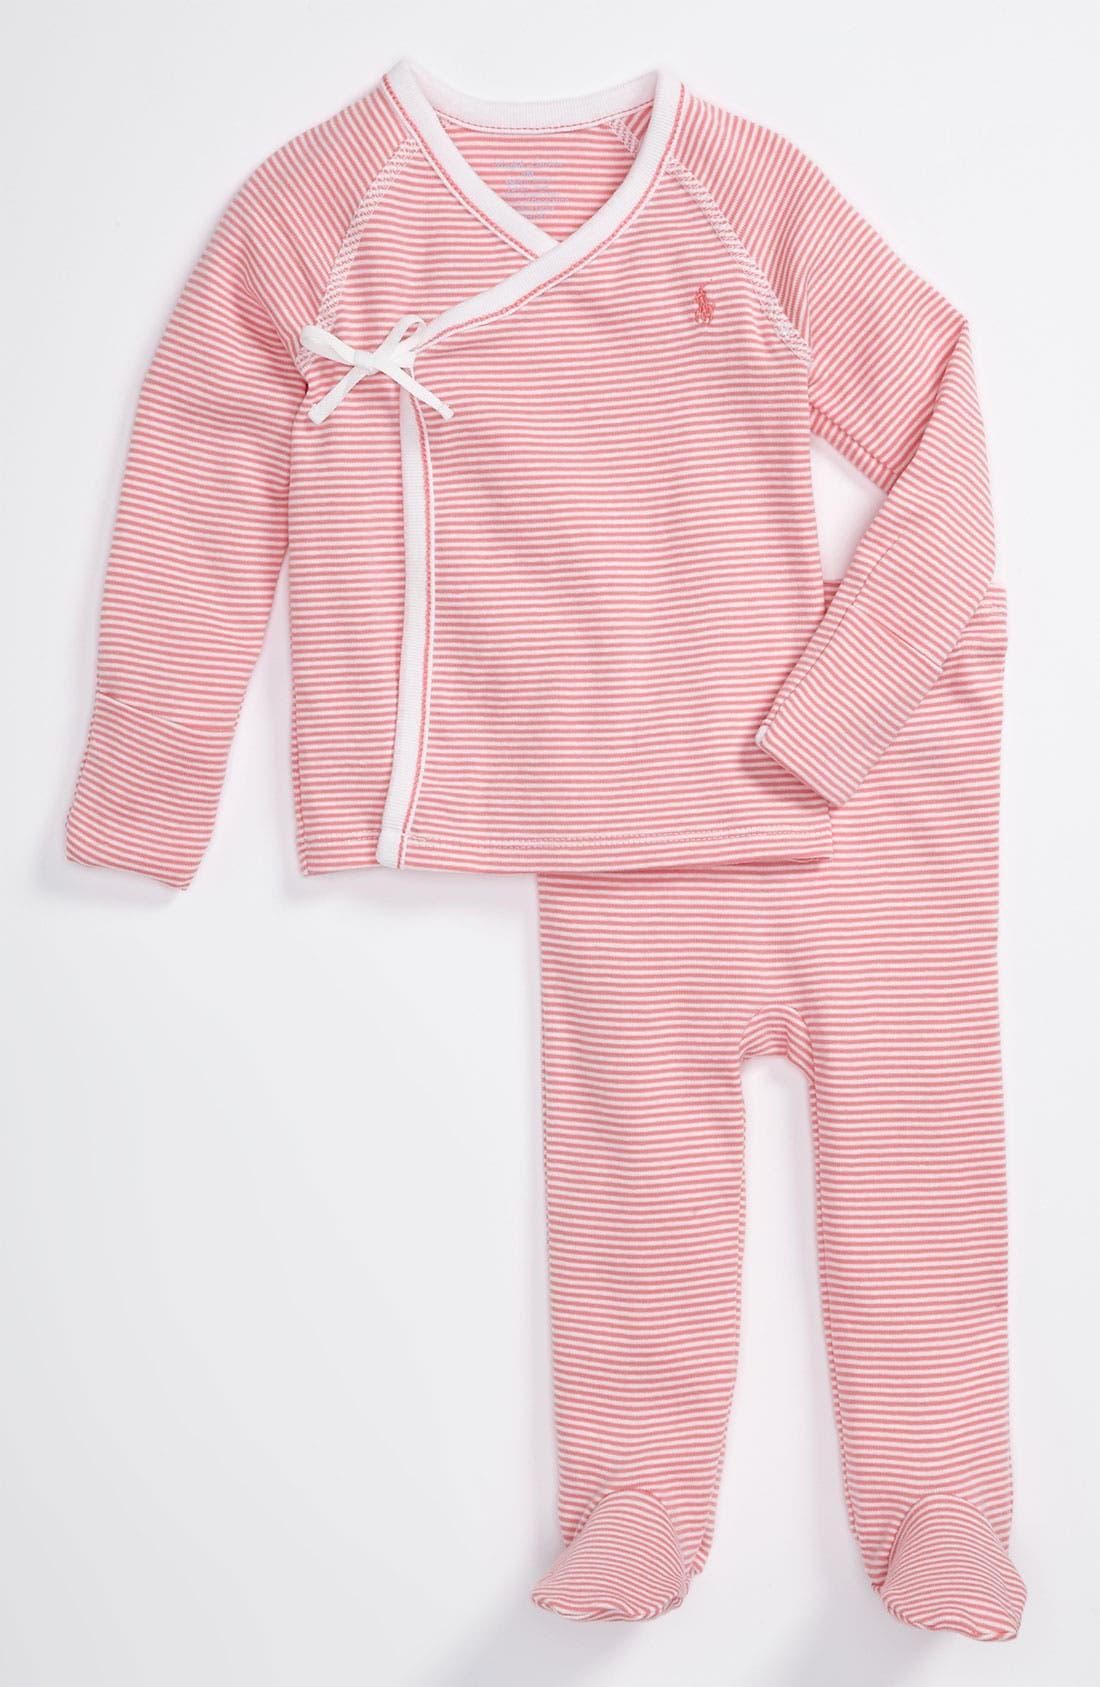 Alternate Image 1 Selected - Ralph Lauren Stripe Top & Footed Pants Set (Baby)